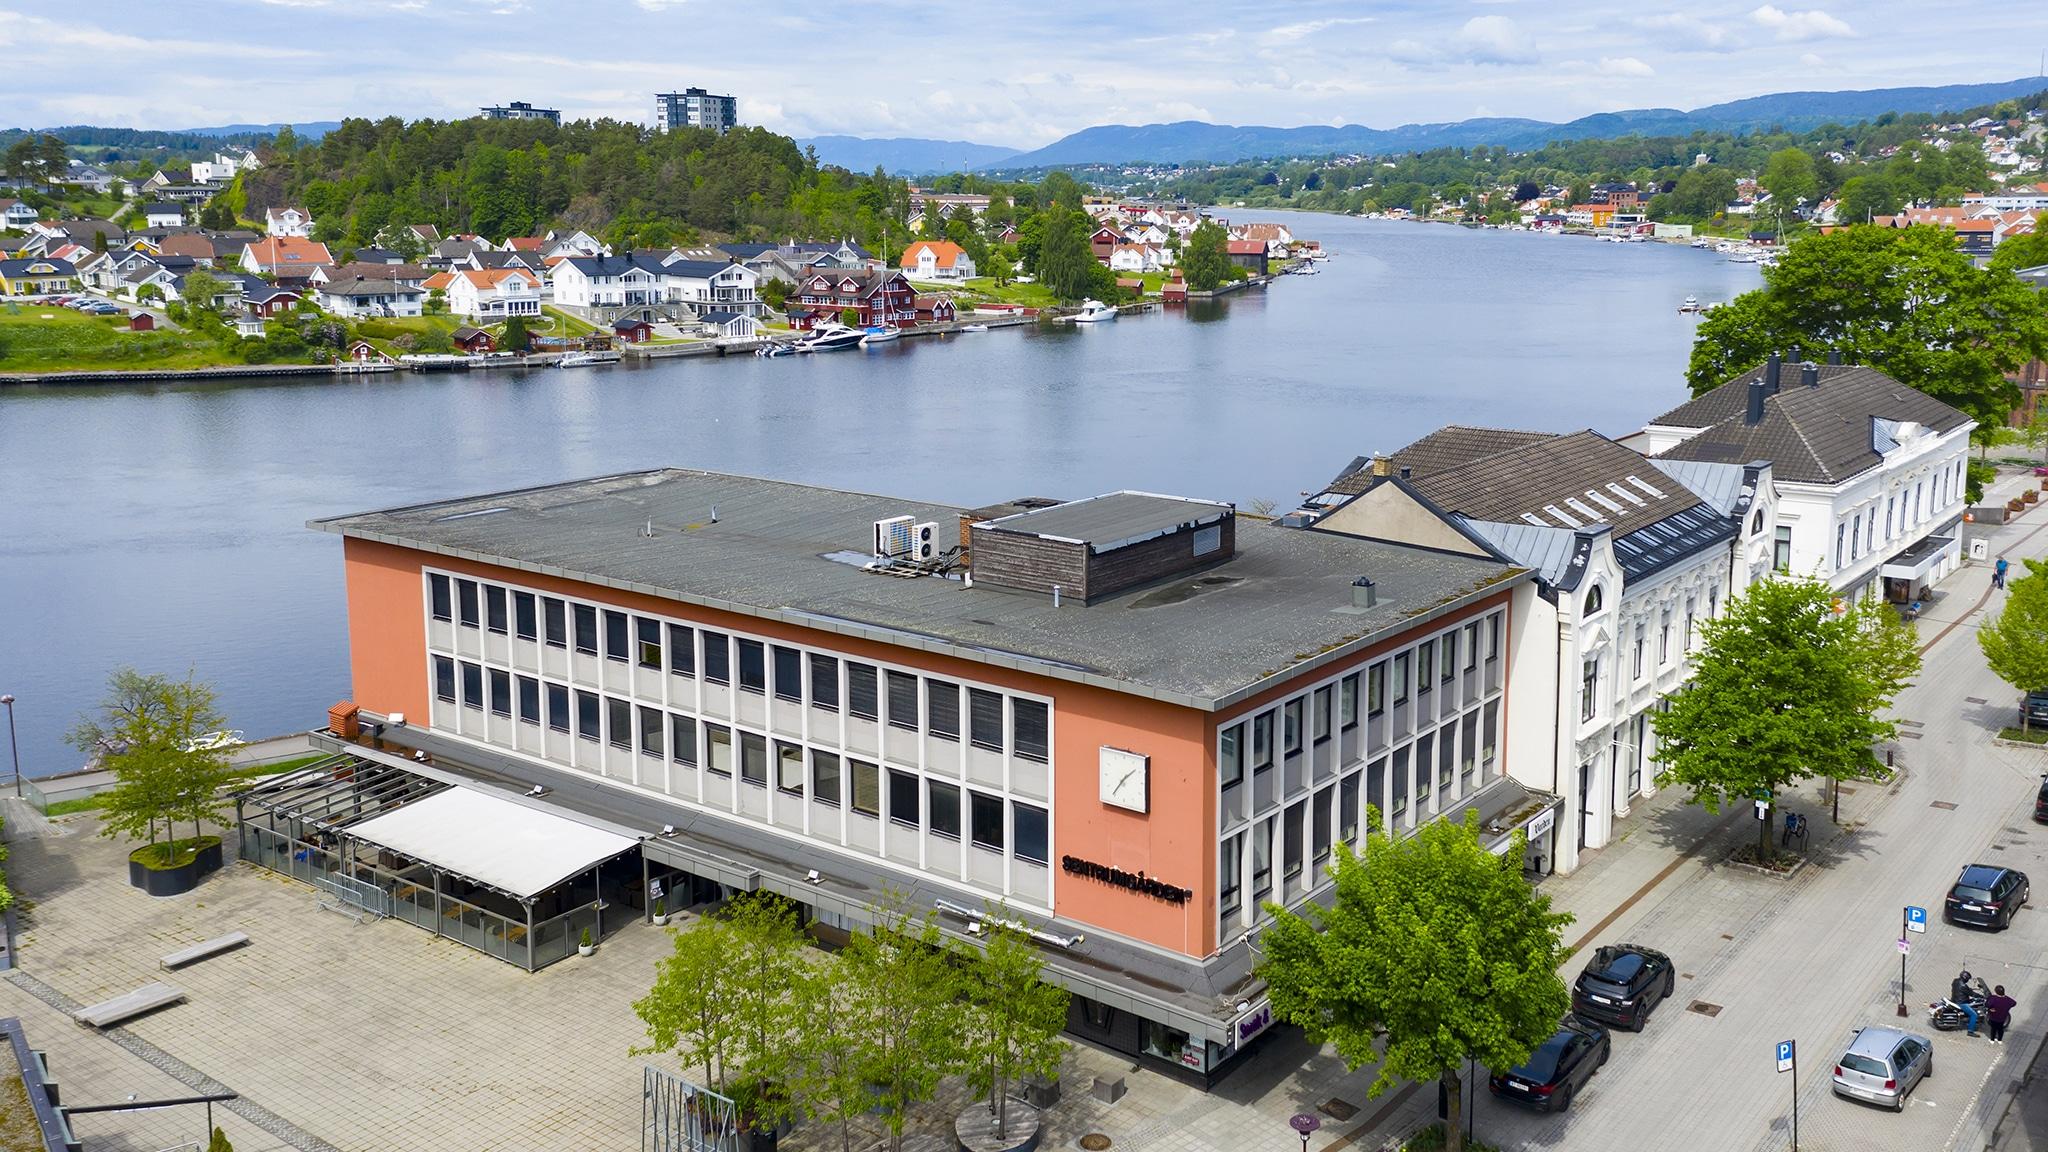 Helsetjeneste kontor sentrumgården storgata 146 Porsgrunn 4